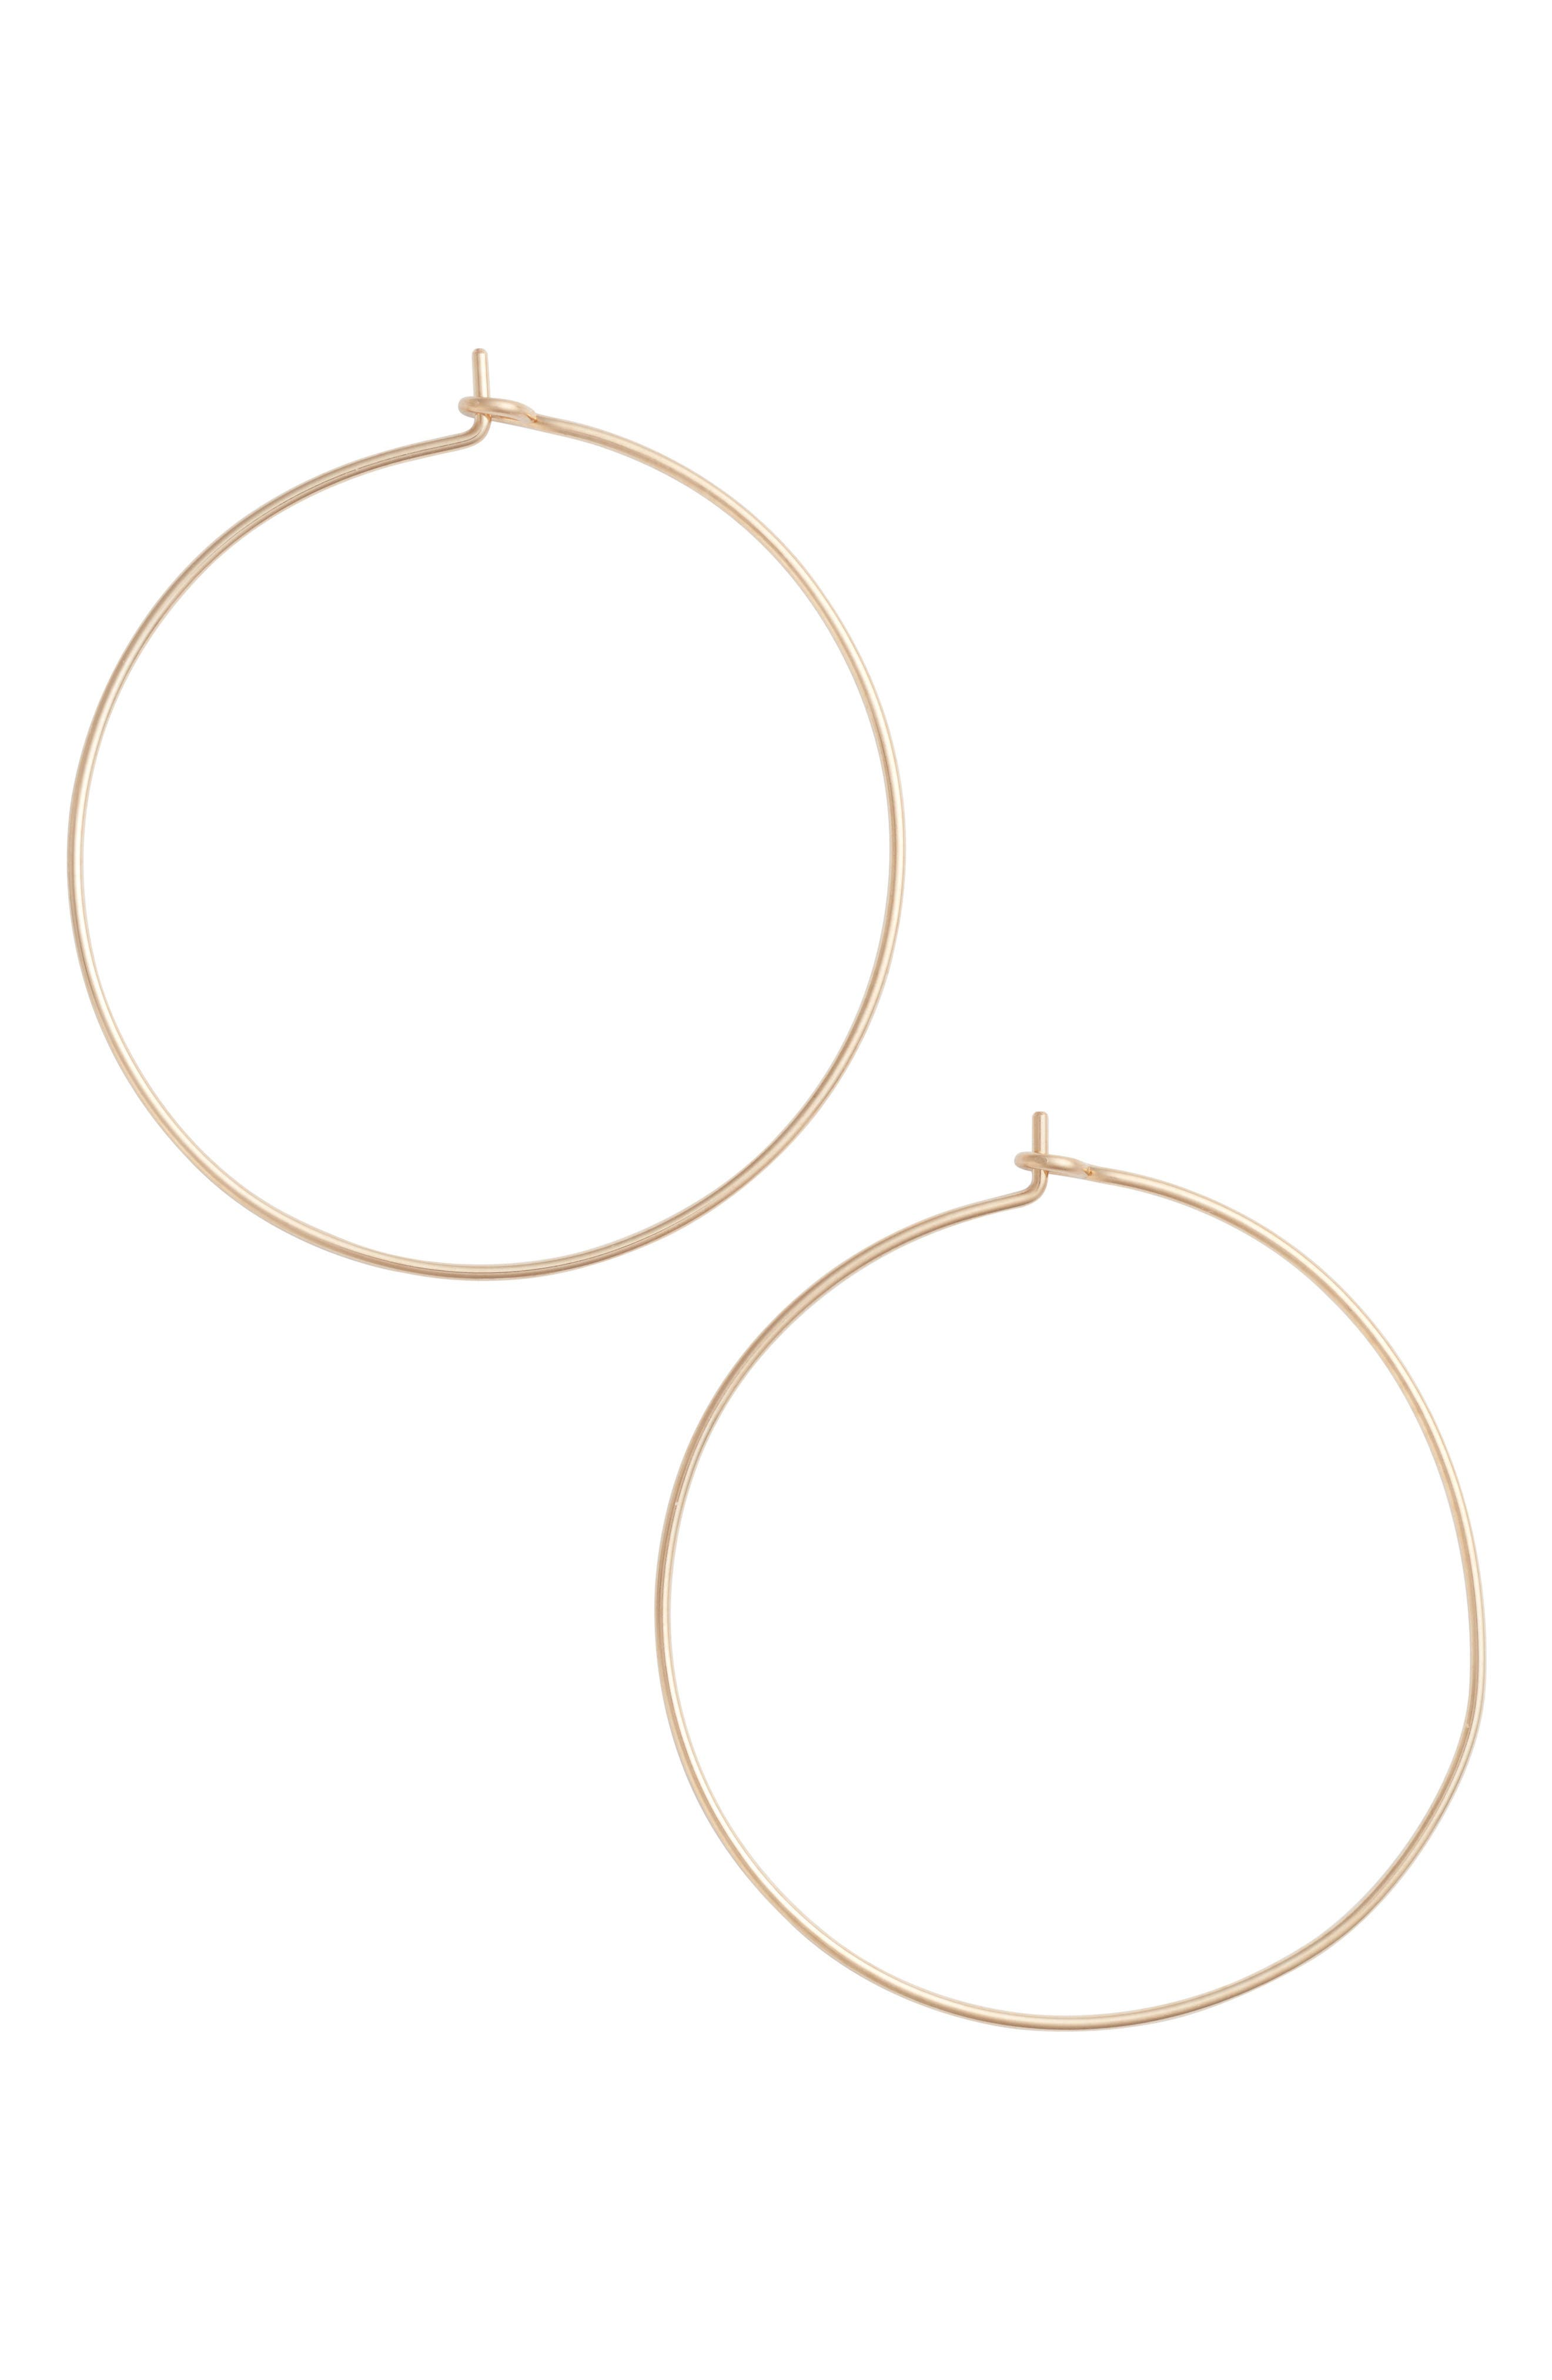 Nashelle Large Pure Hoop Earrings